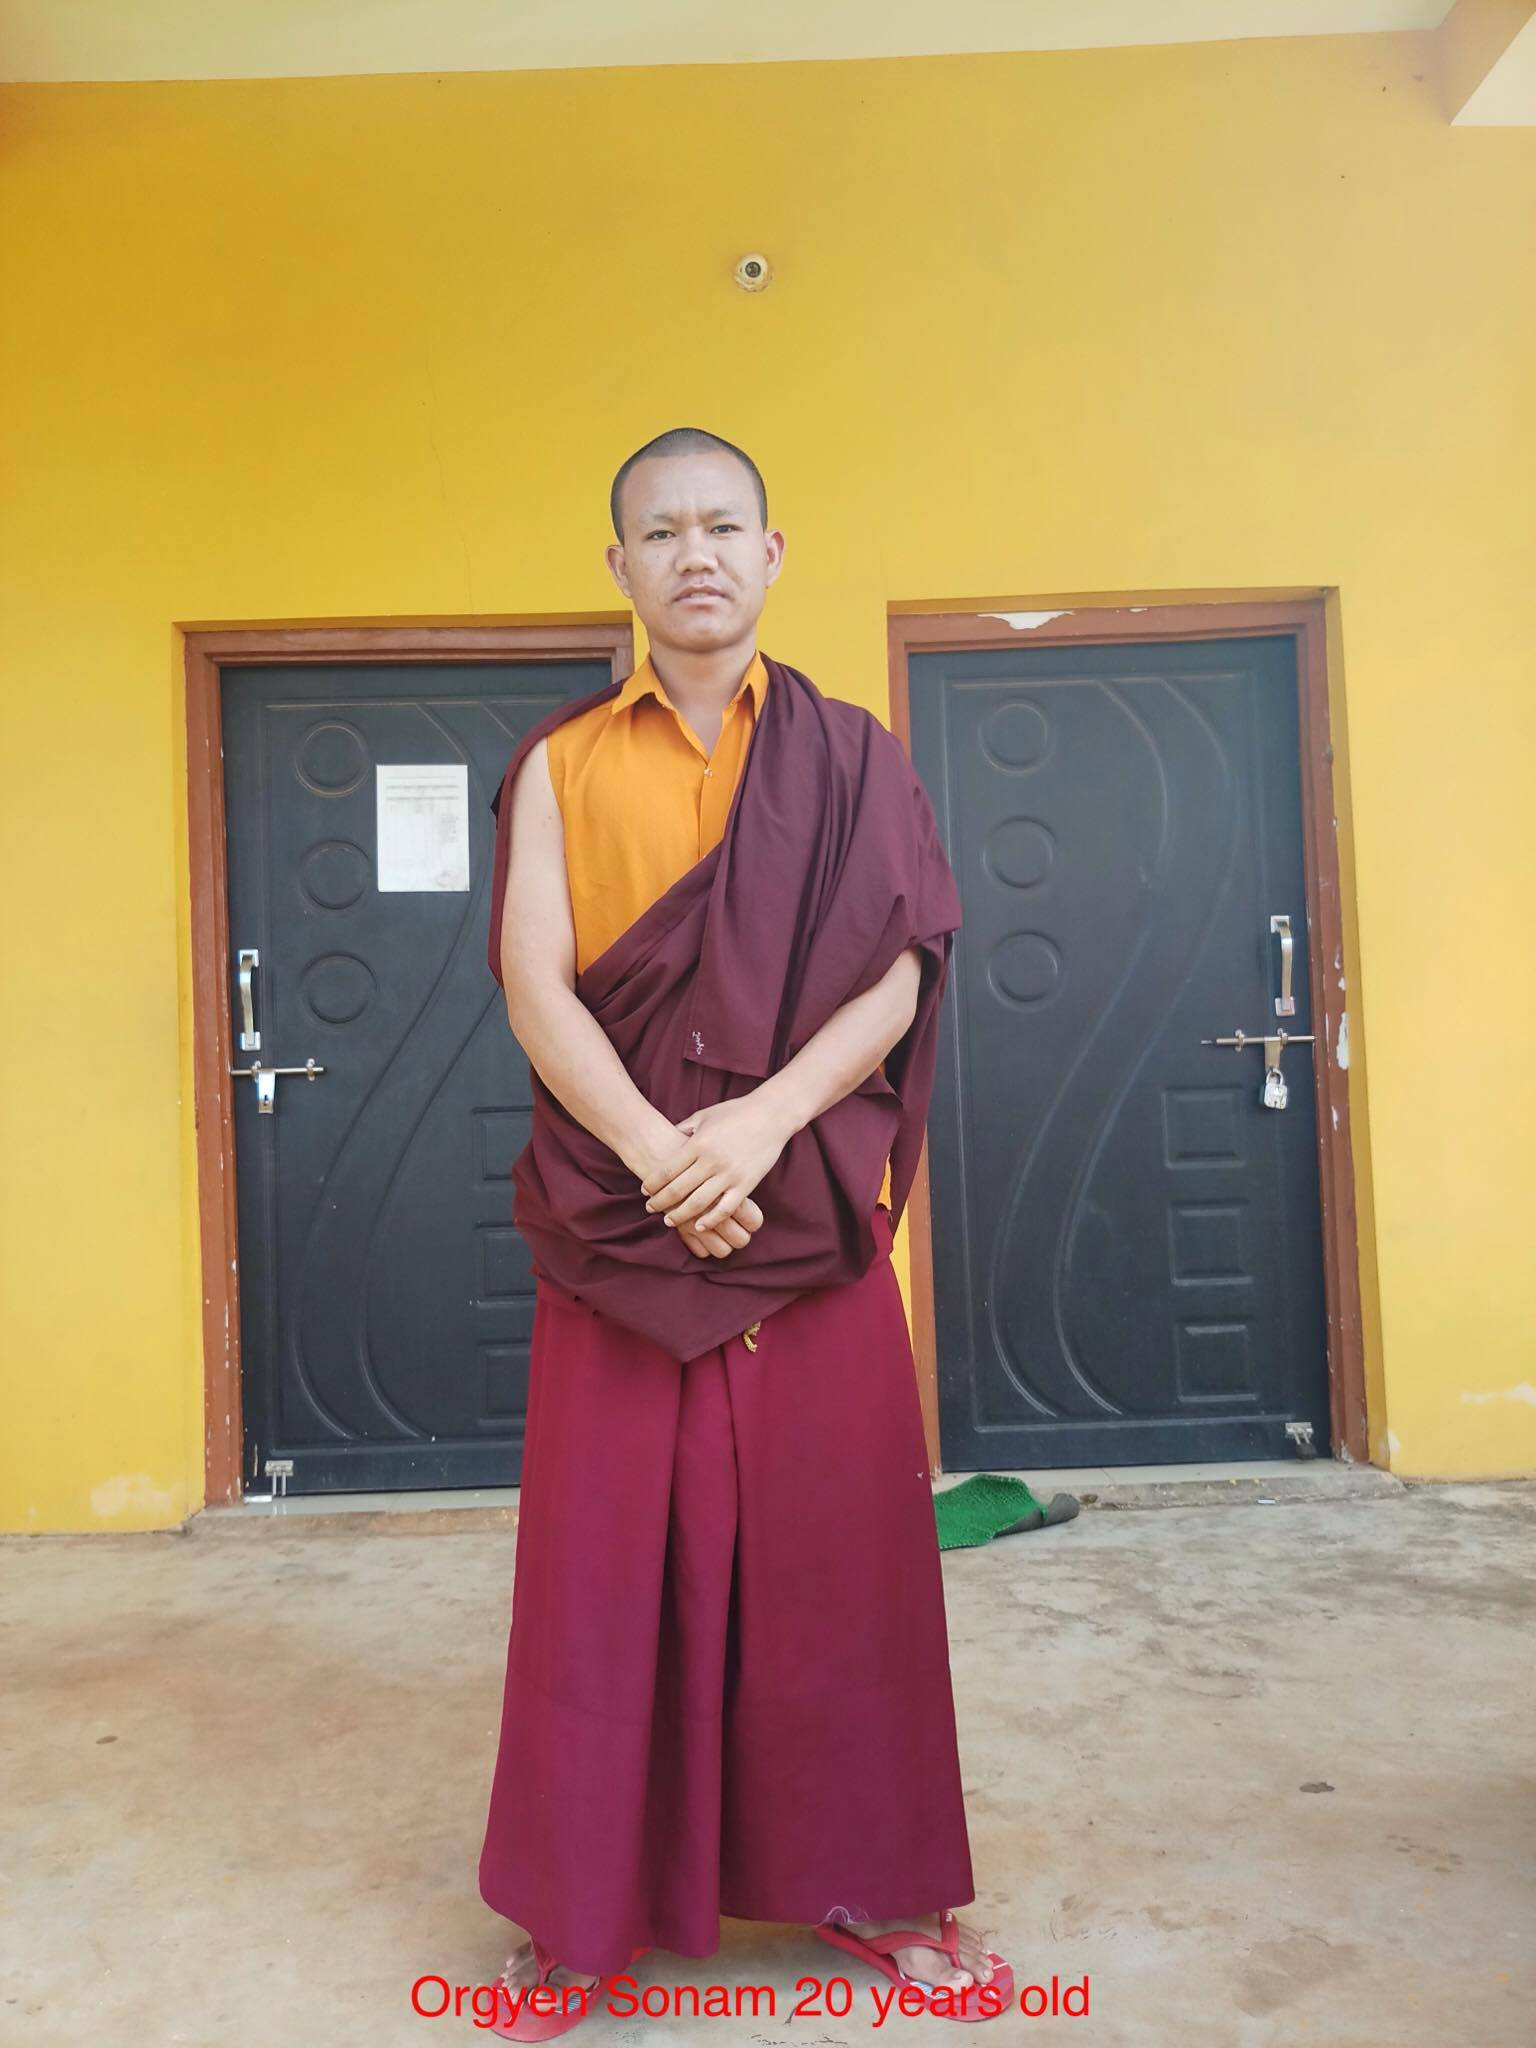 Monk_Orgyen_Sonam_20yrs_old.jpg